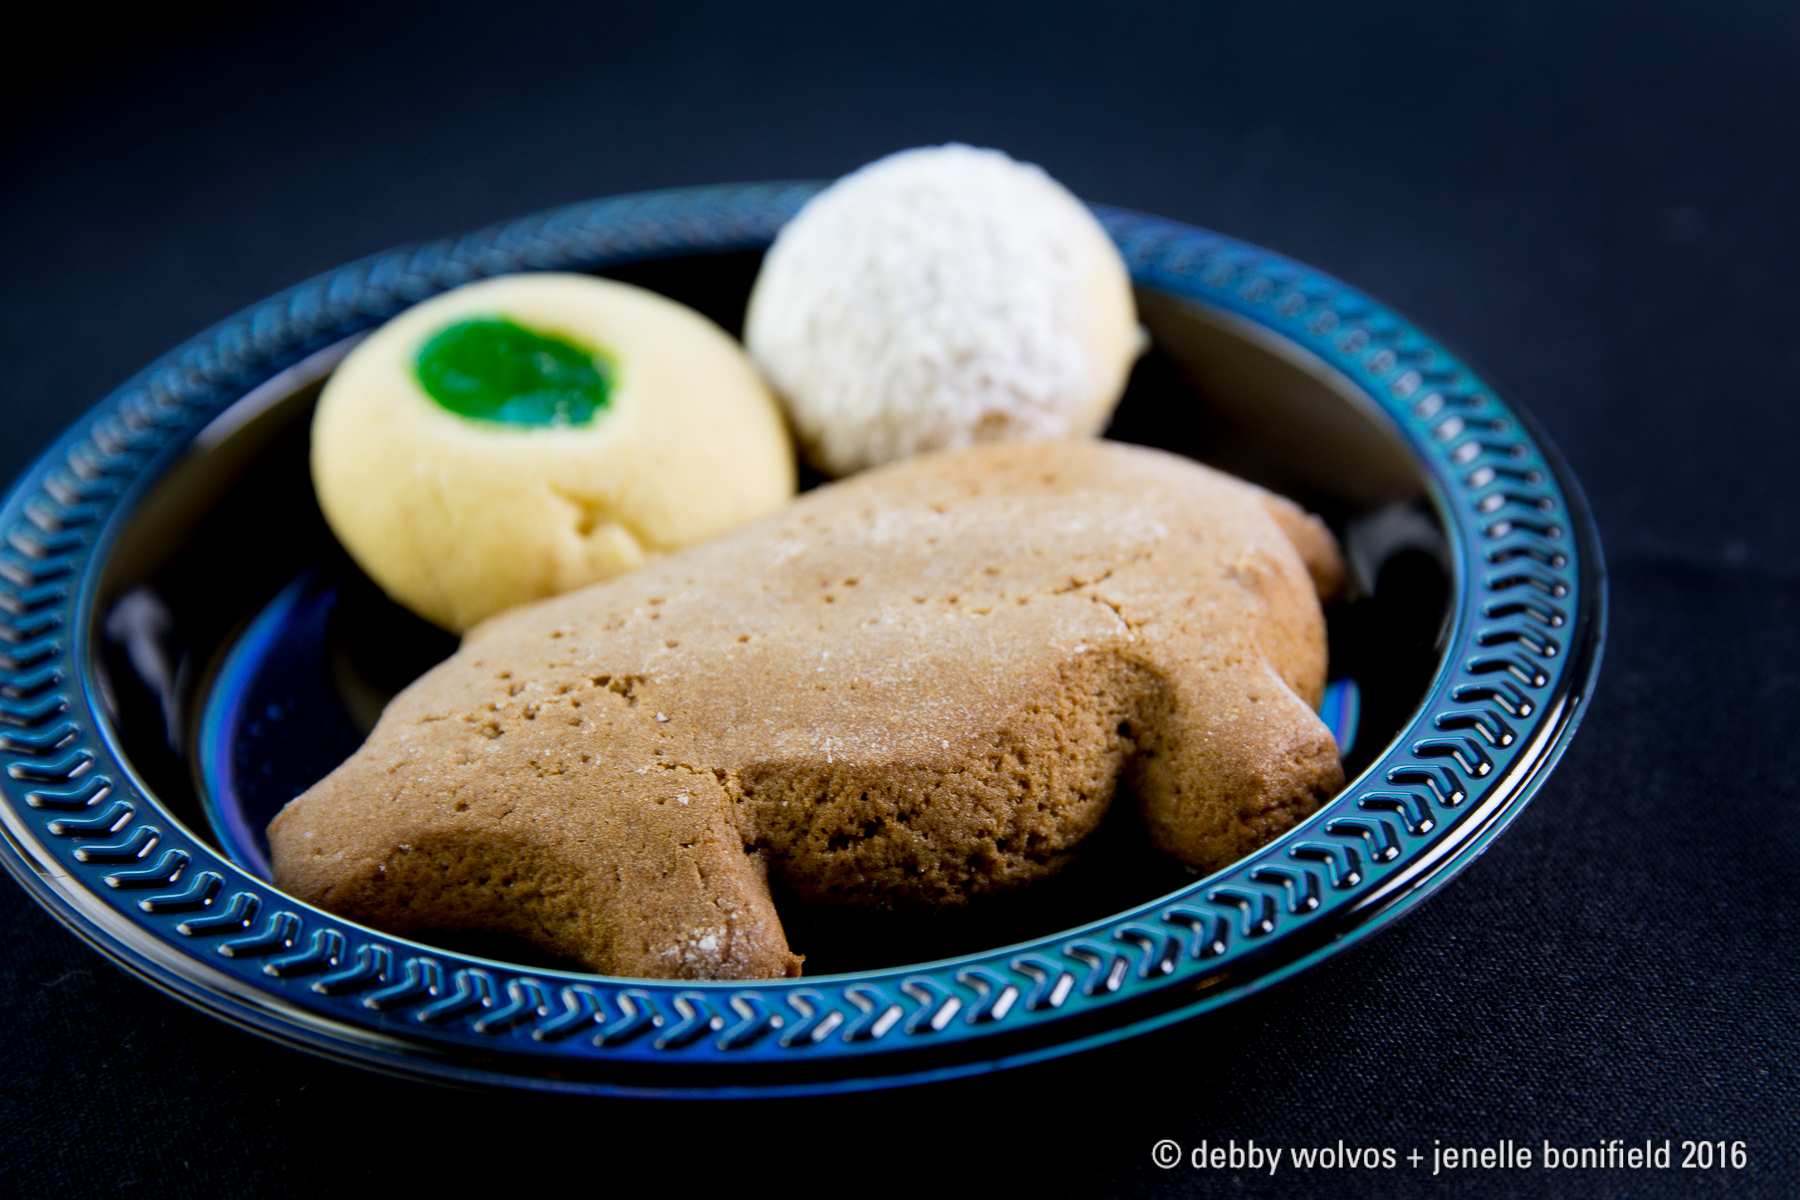 Mexican pastries - Estrella Bakery